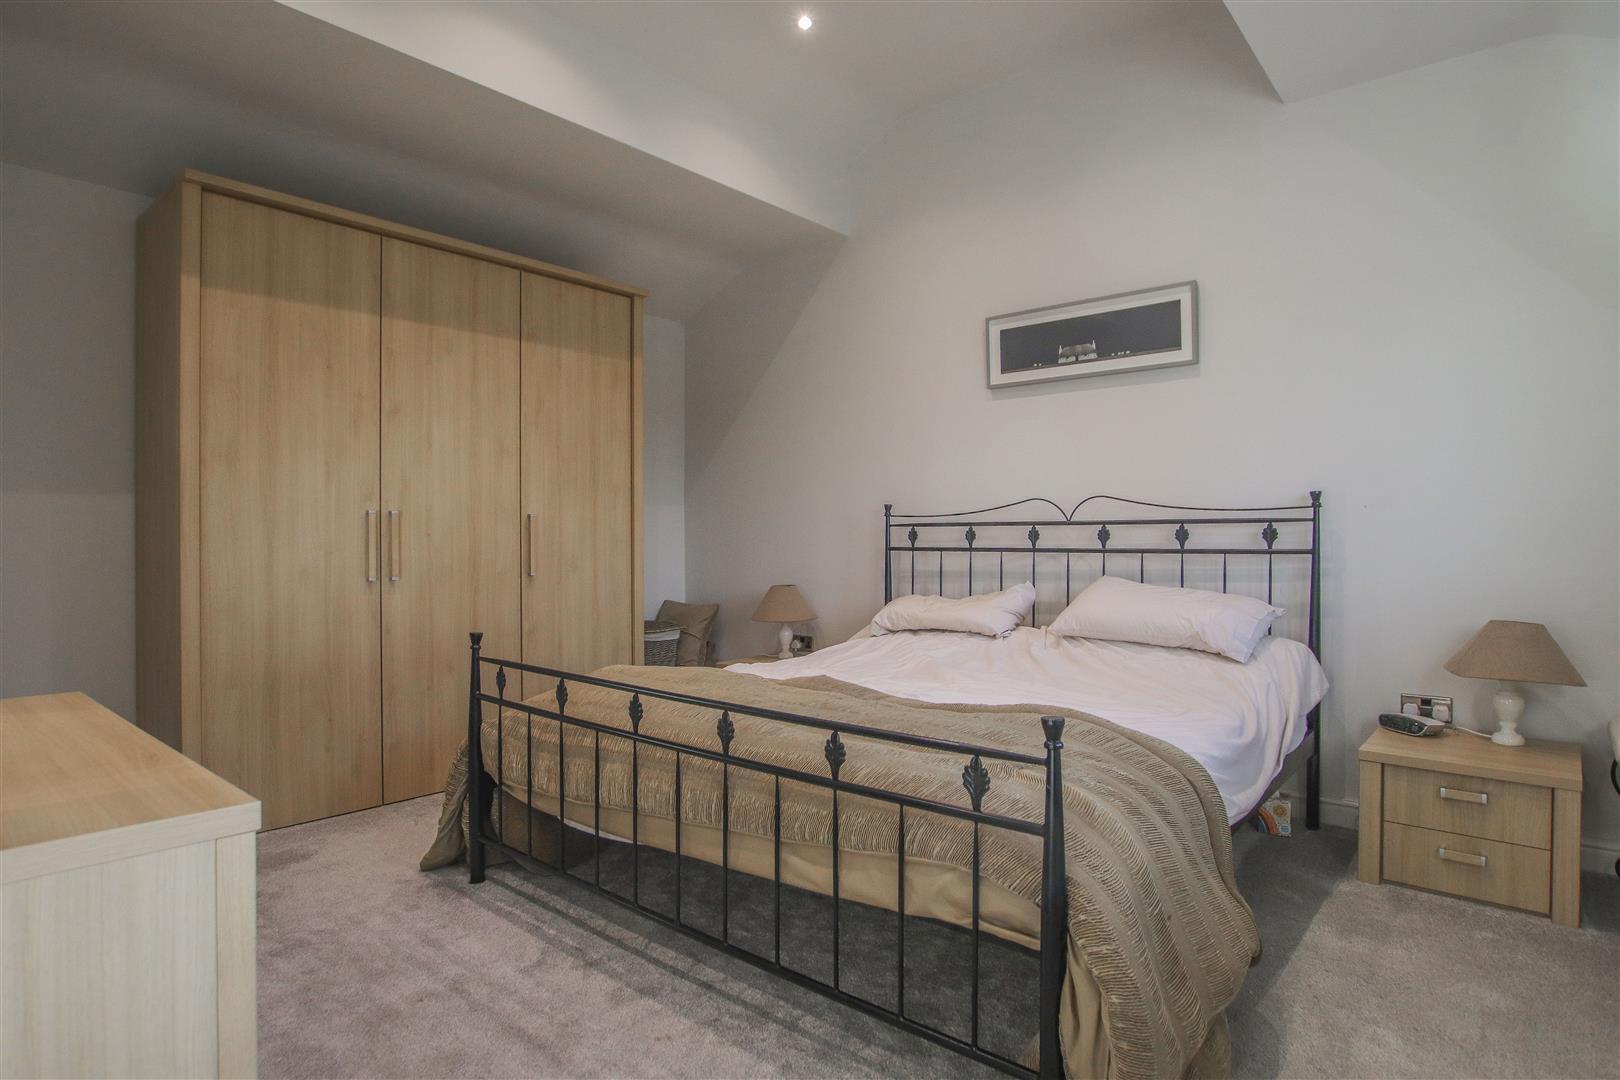 6 Bedroom Barn Conversion For Sale - 25.JPG